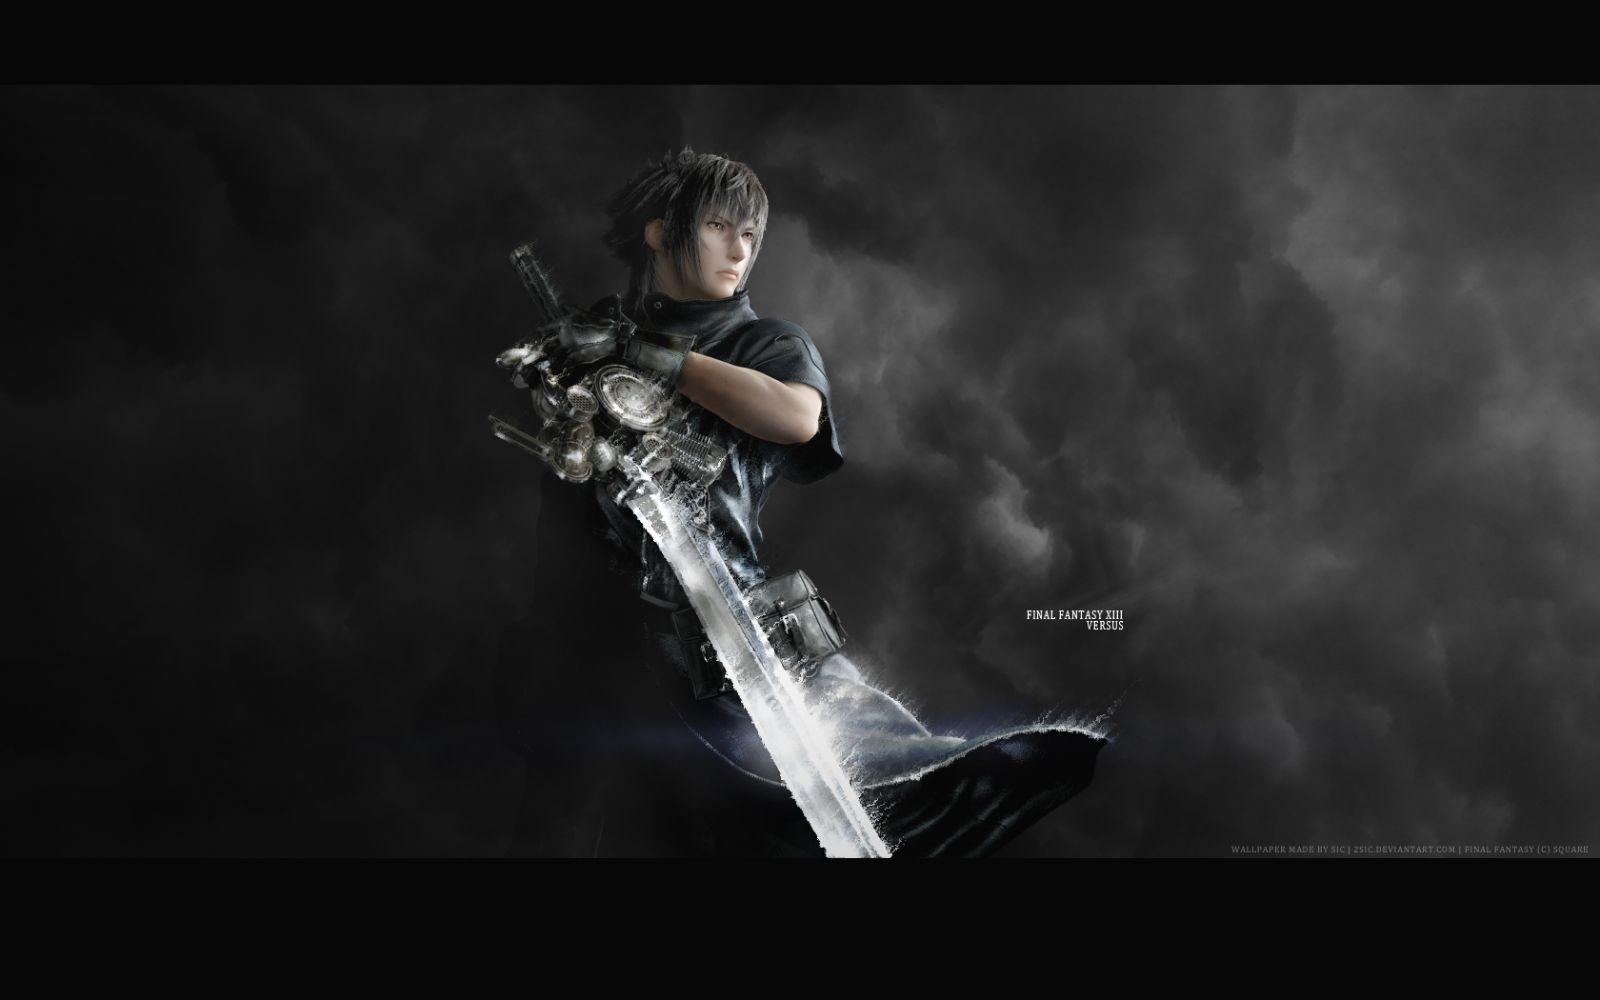 Final Fantasy Versus XIII (Light)